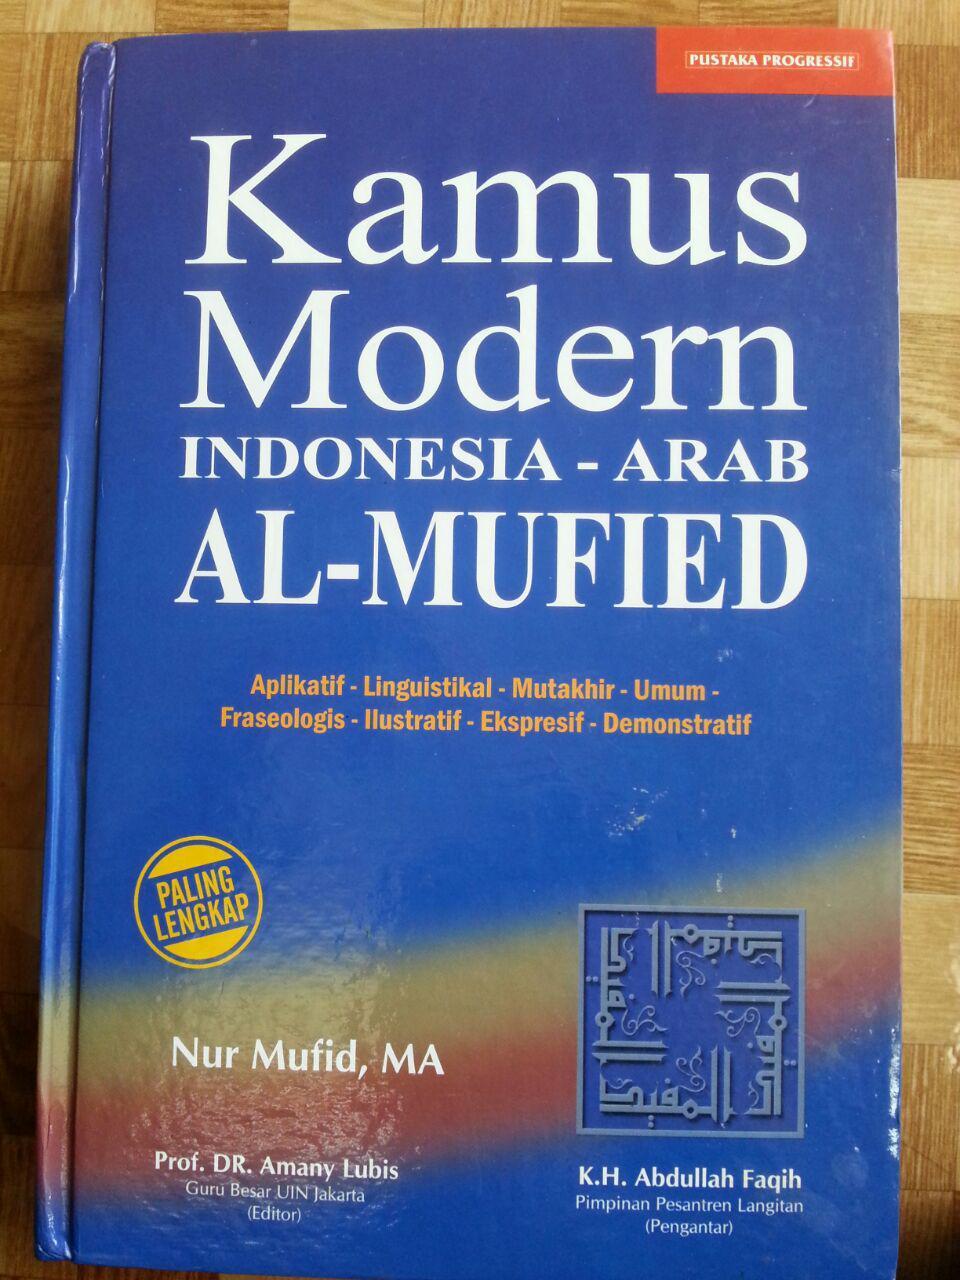 Kamus Modern Indonesia-Arab Al-Mufied cover 2